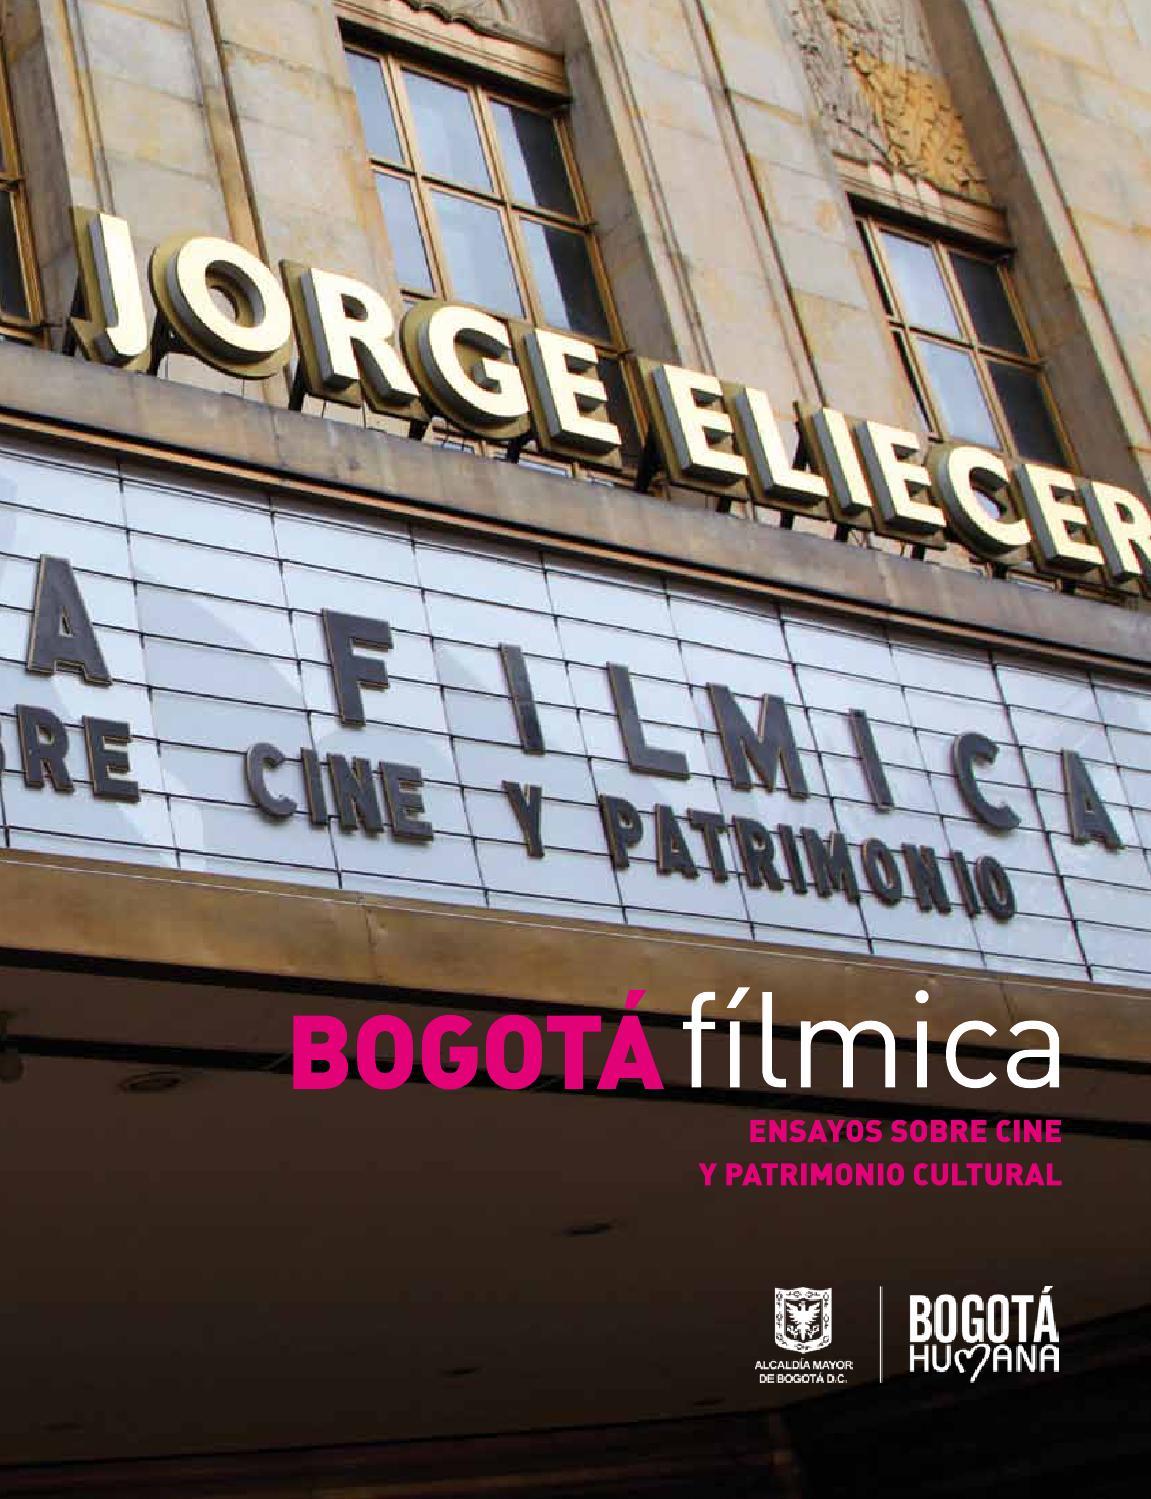 Bogotá fílmica by Instituto Distrital Patrimonio Cultural - issuu b2437d50d6b